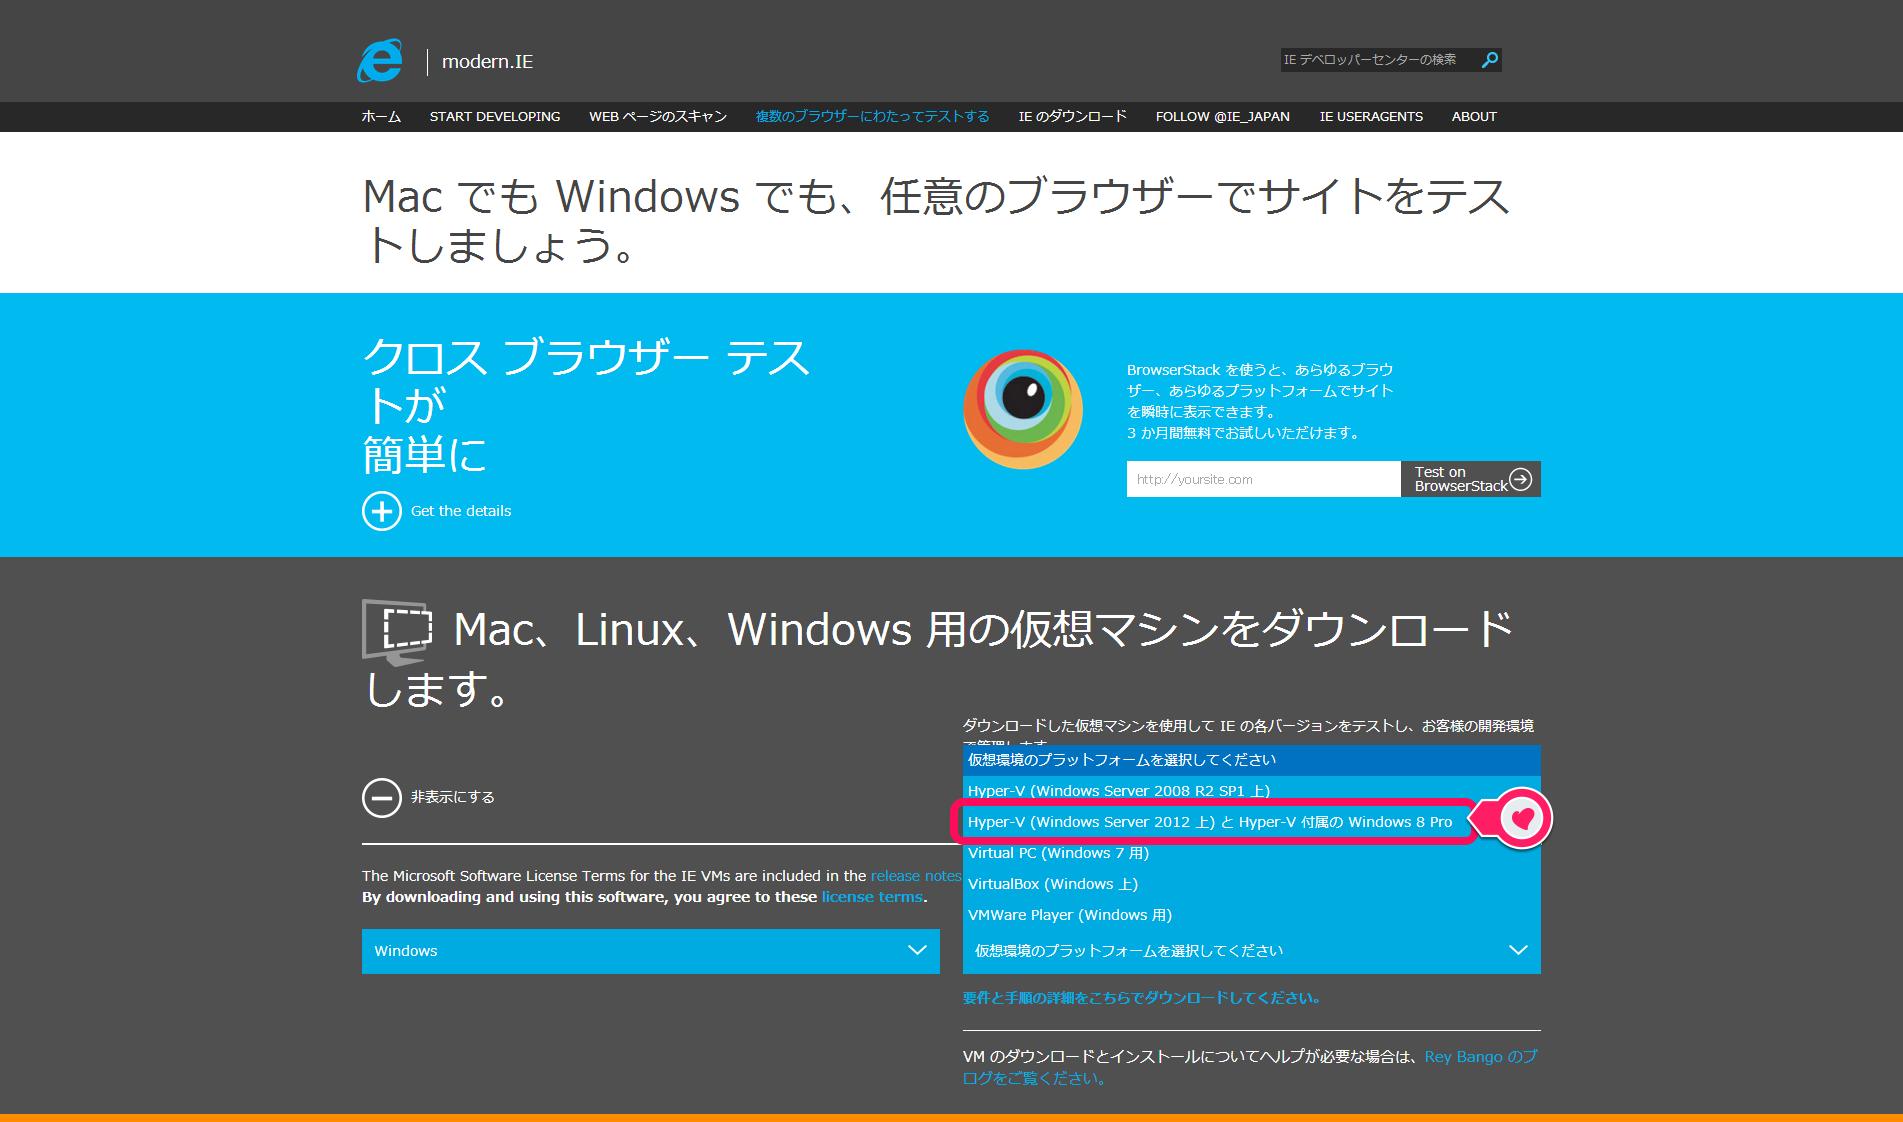 Windowsを選んで、上から2番目のHyper-Vを選ぼう